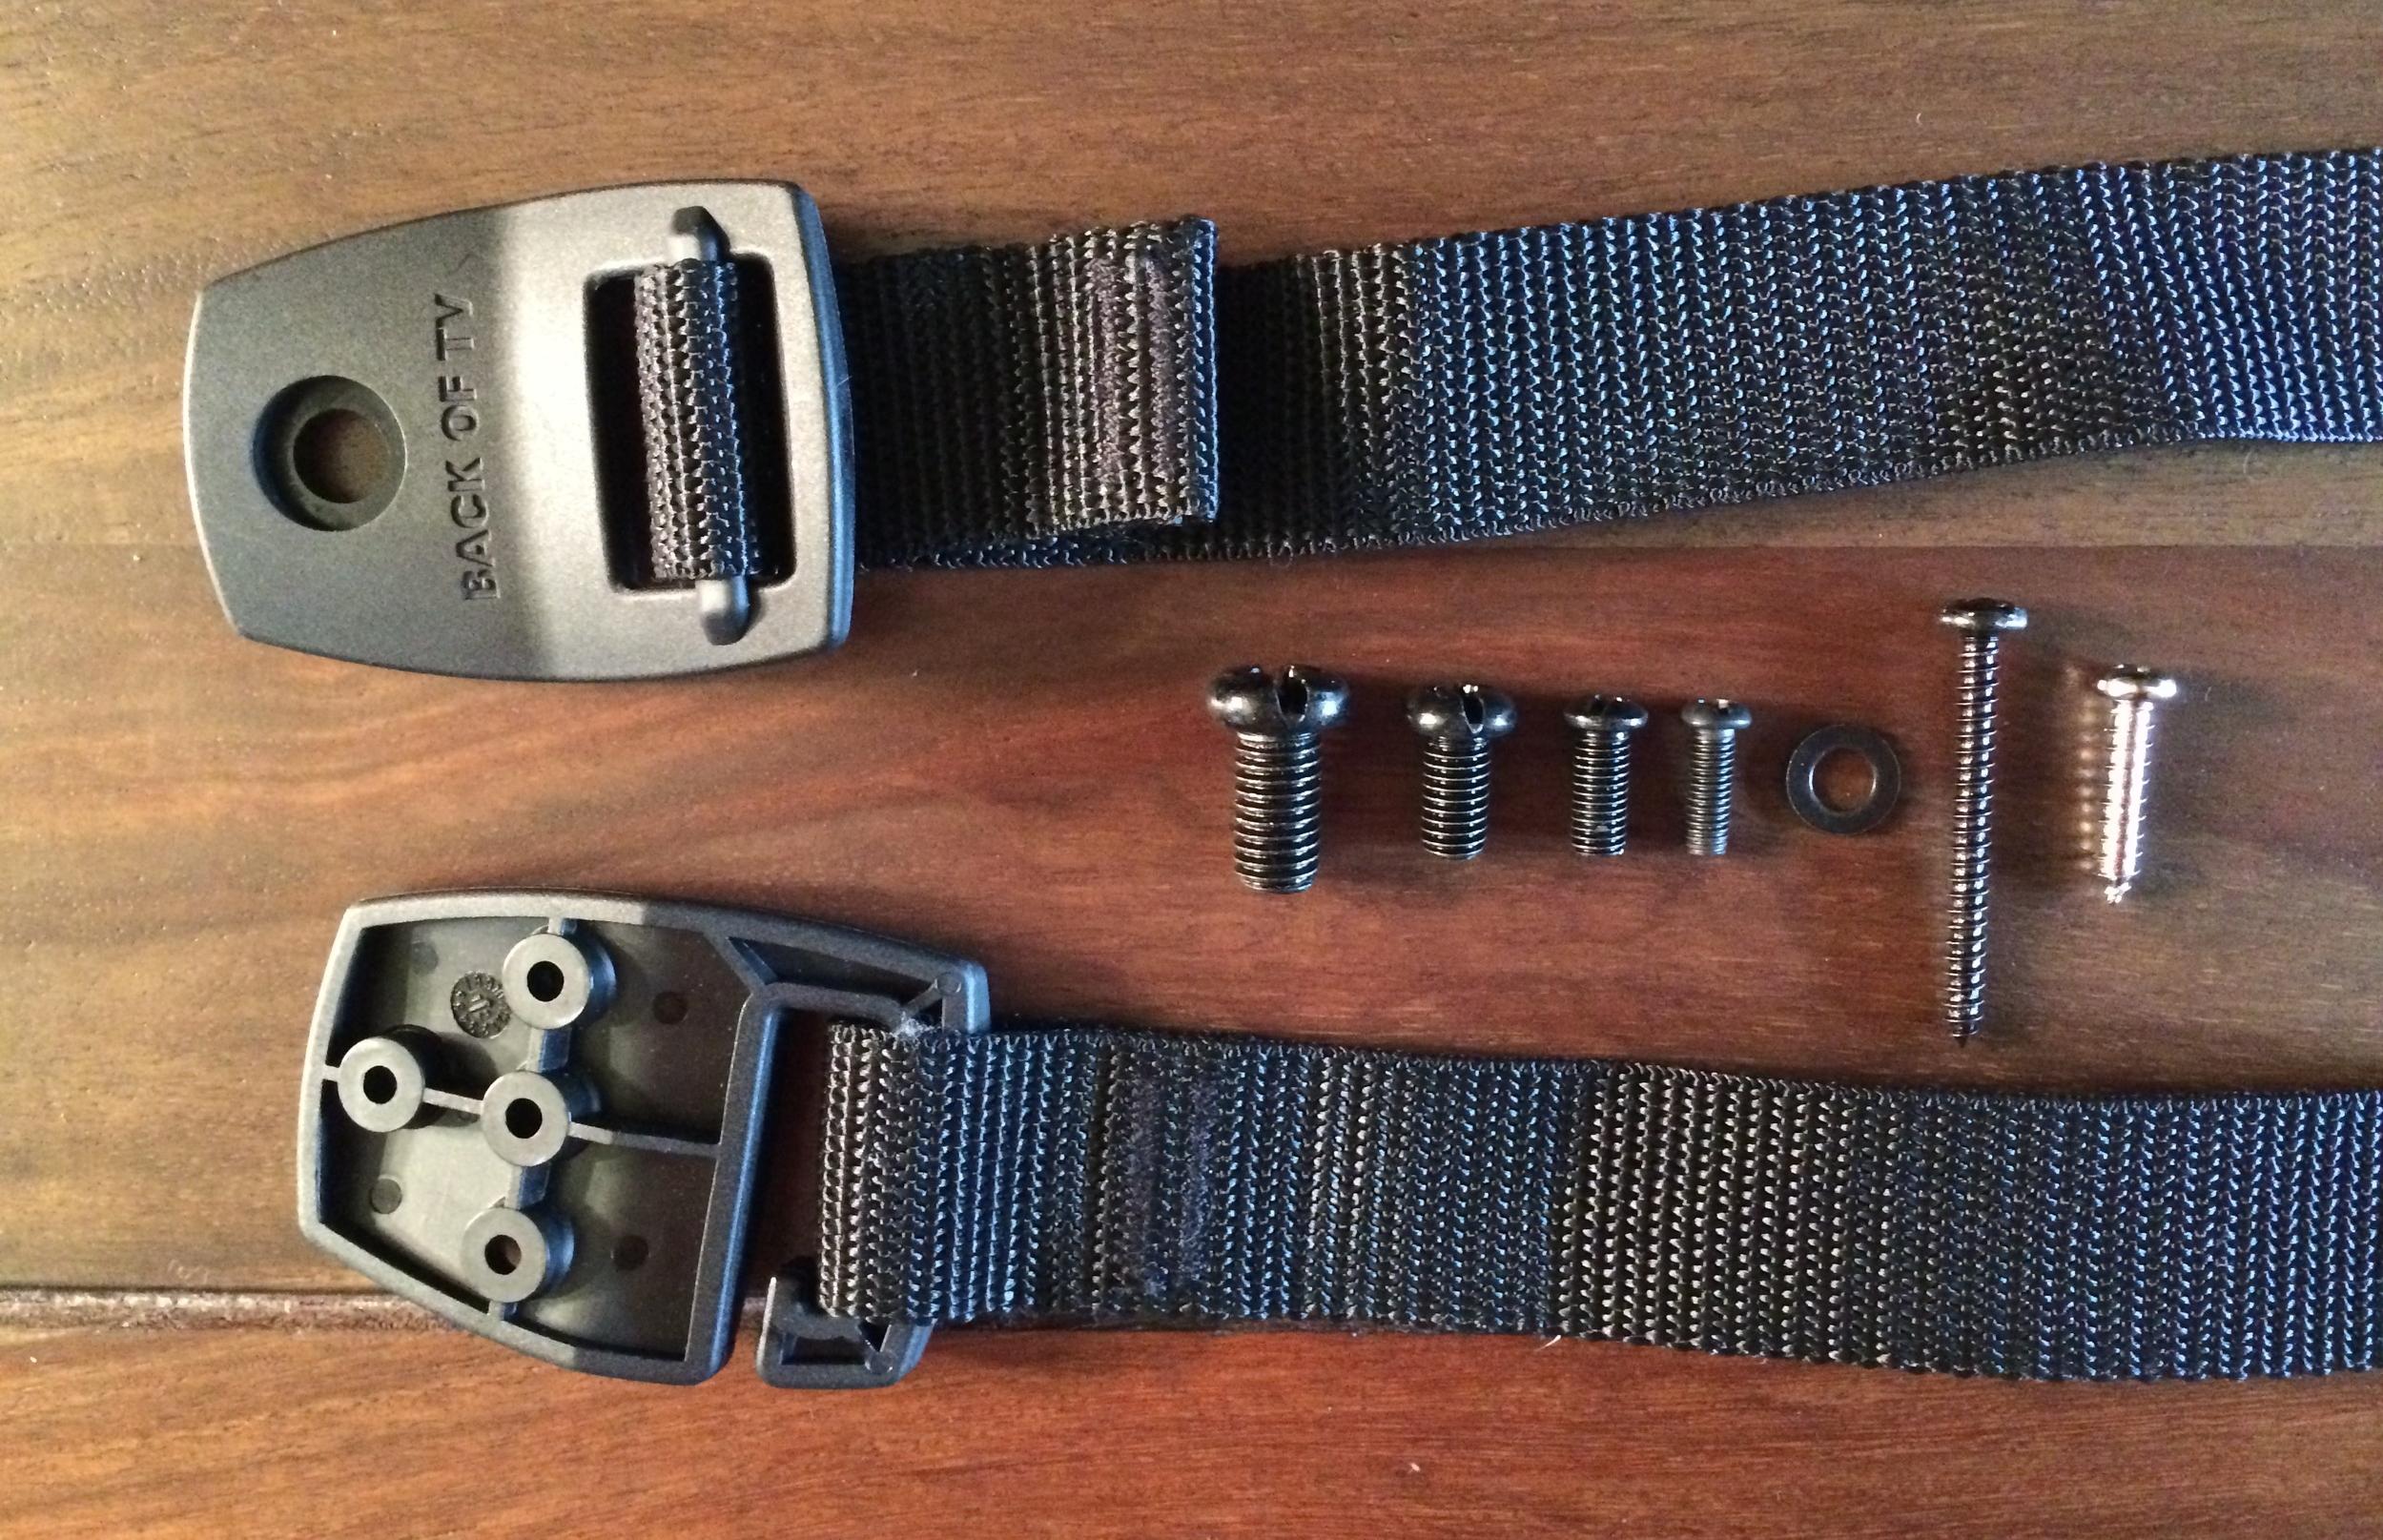 TV Anti-tip strap and mounting hardware